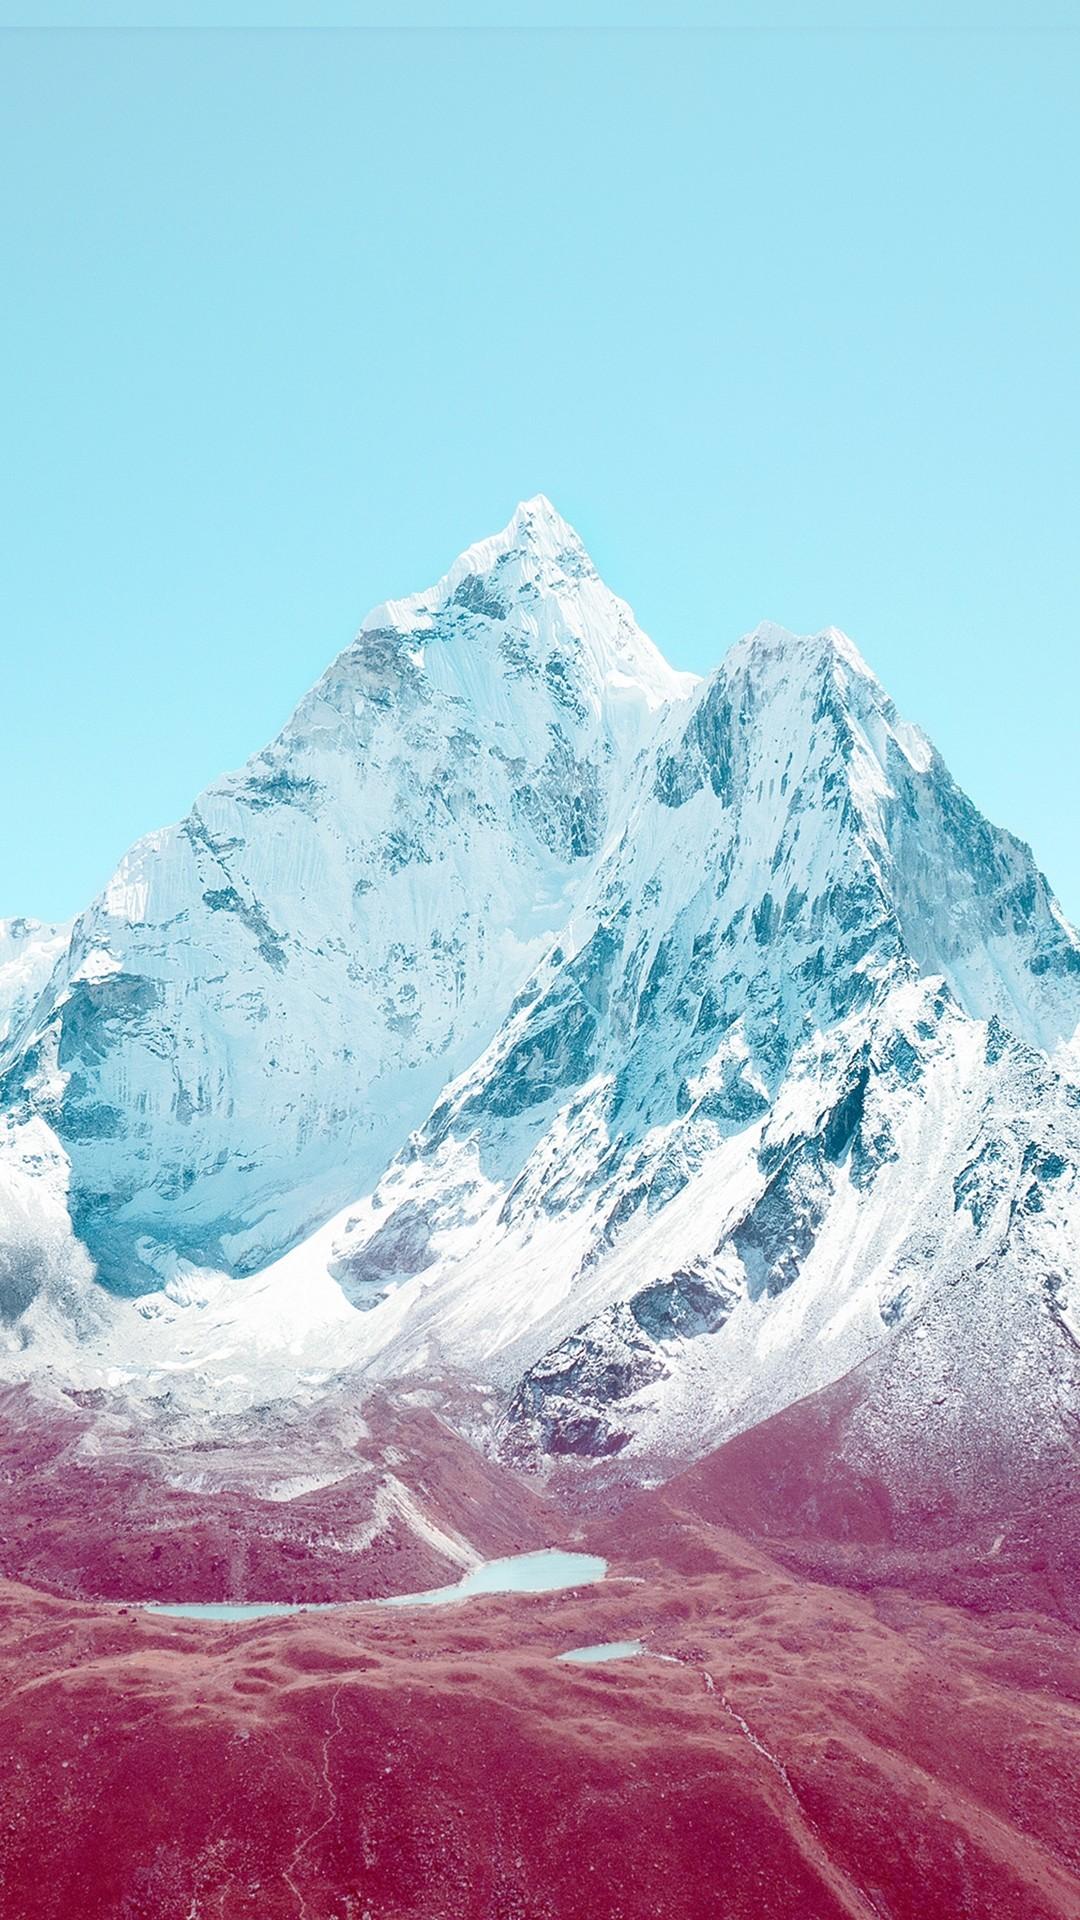 Mountain hd wallpaper for mobile